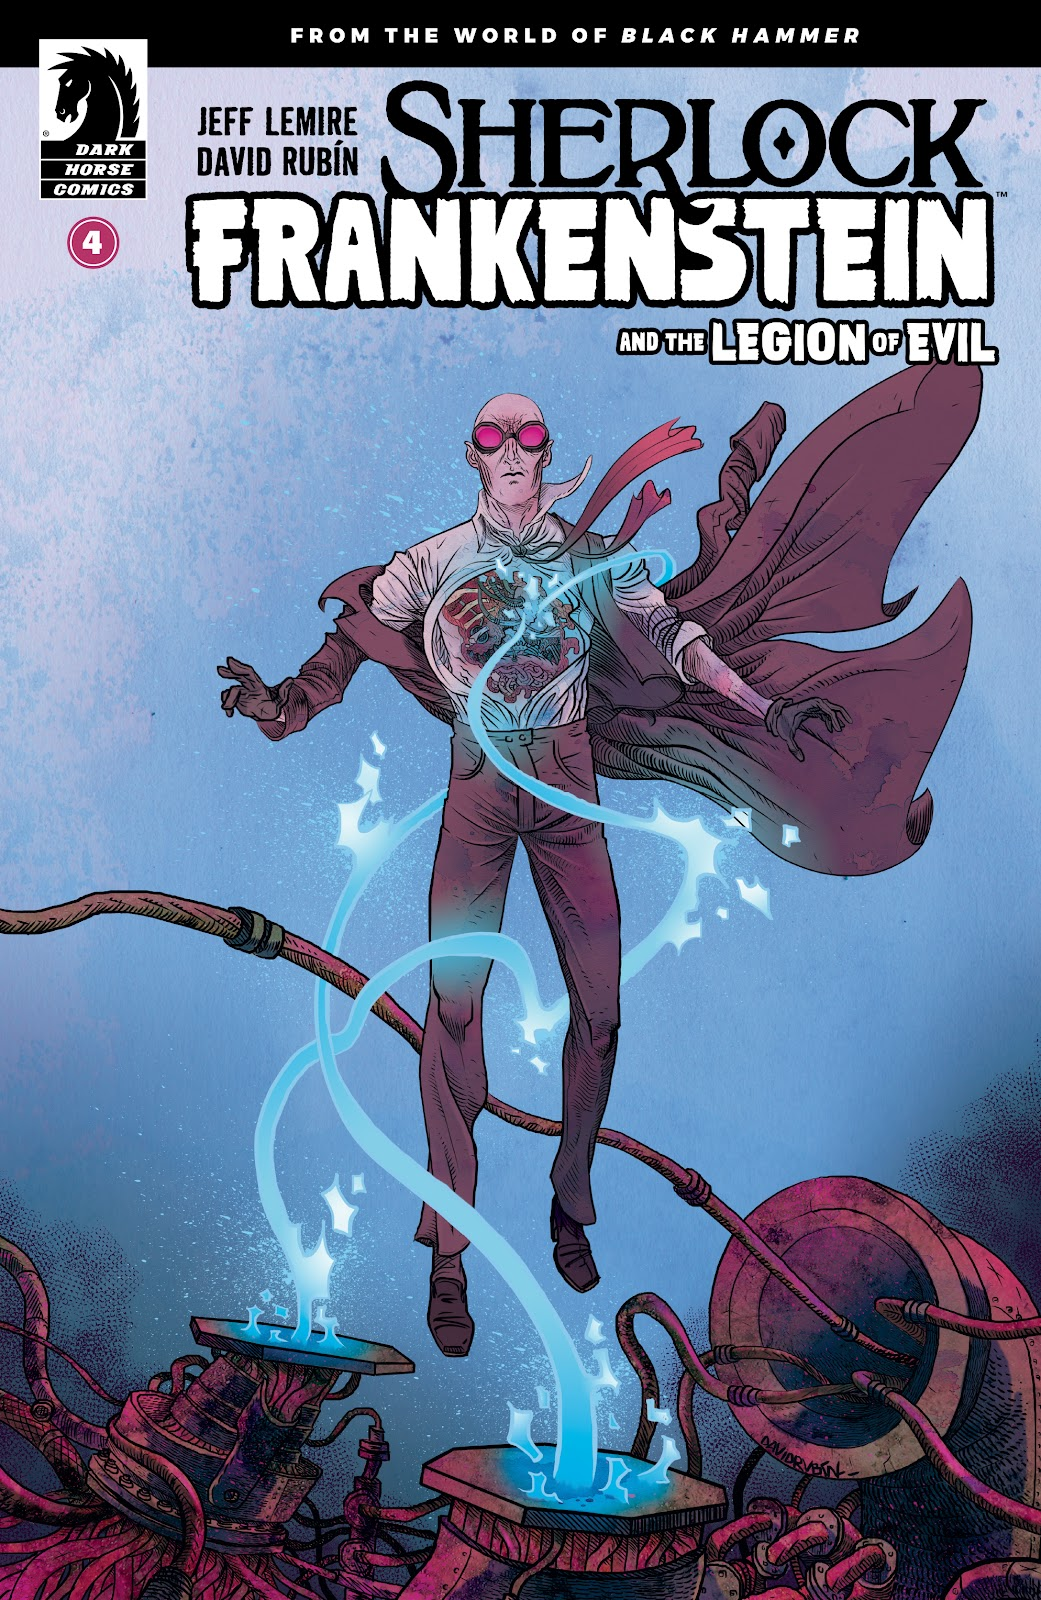 Read online Sherlock Frankenstein and the Legion of Evil comic -  Issue #4 - 1